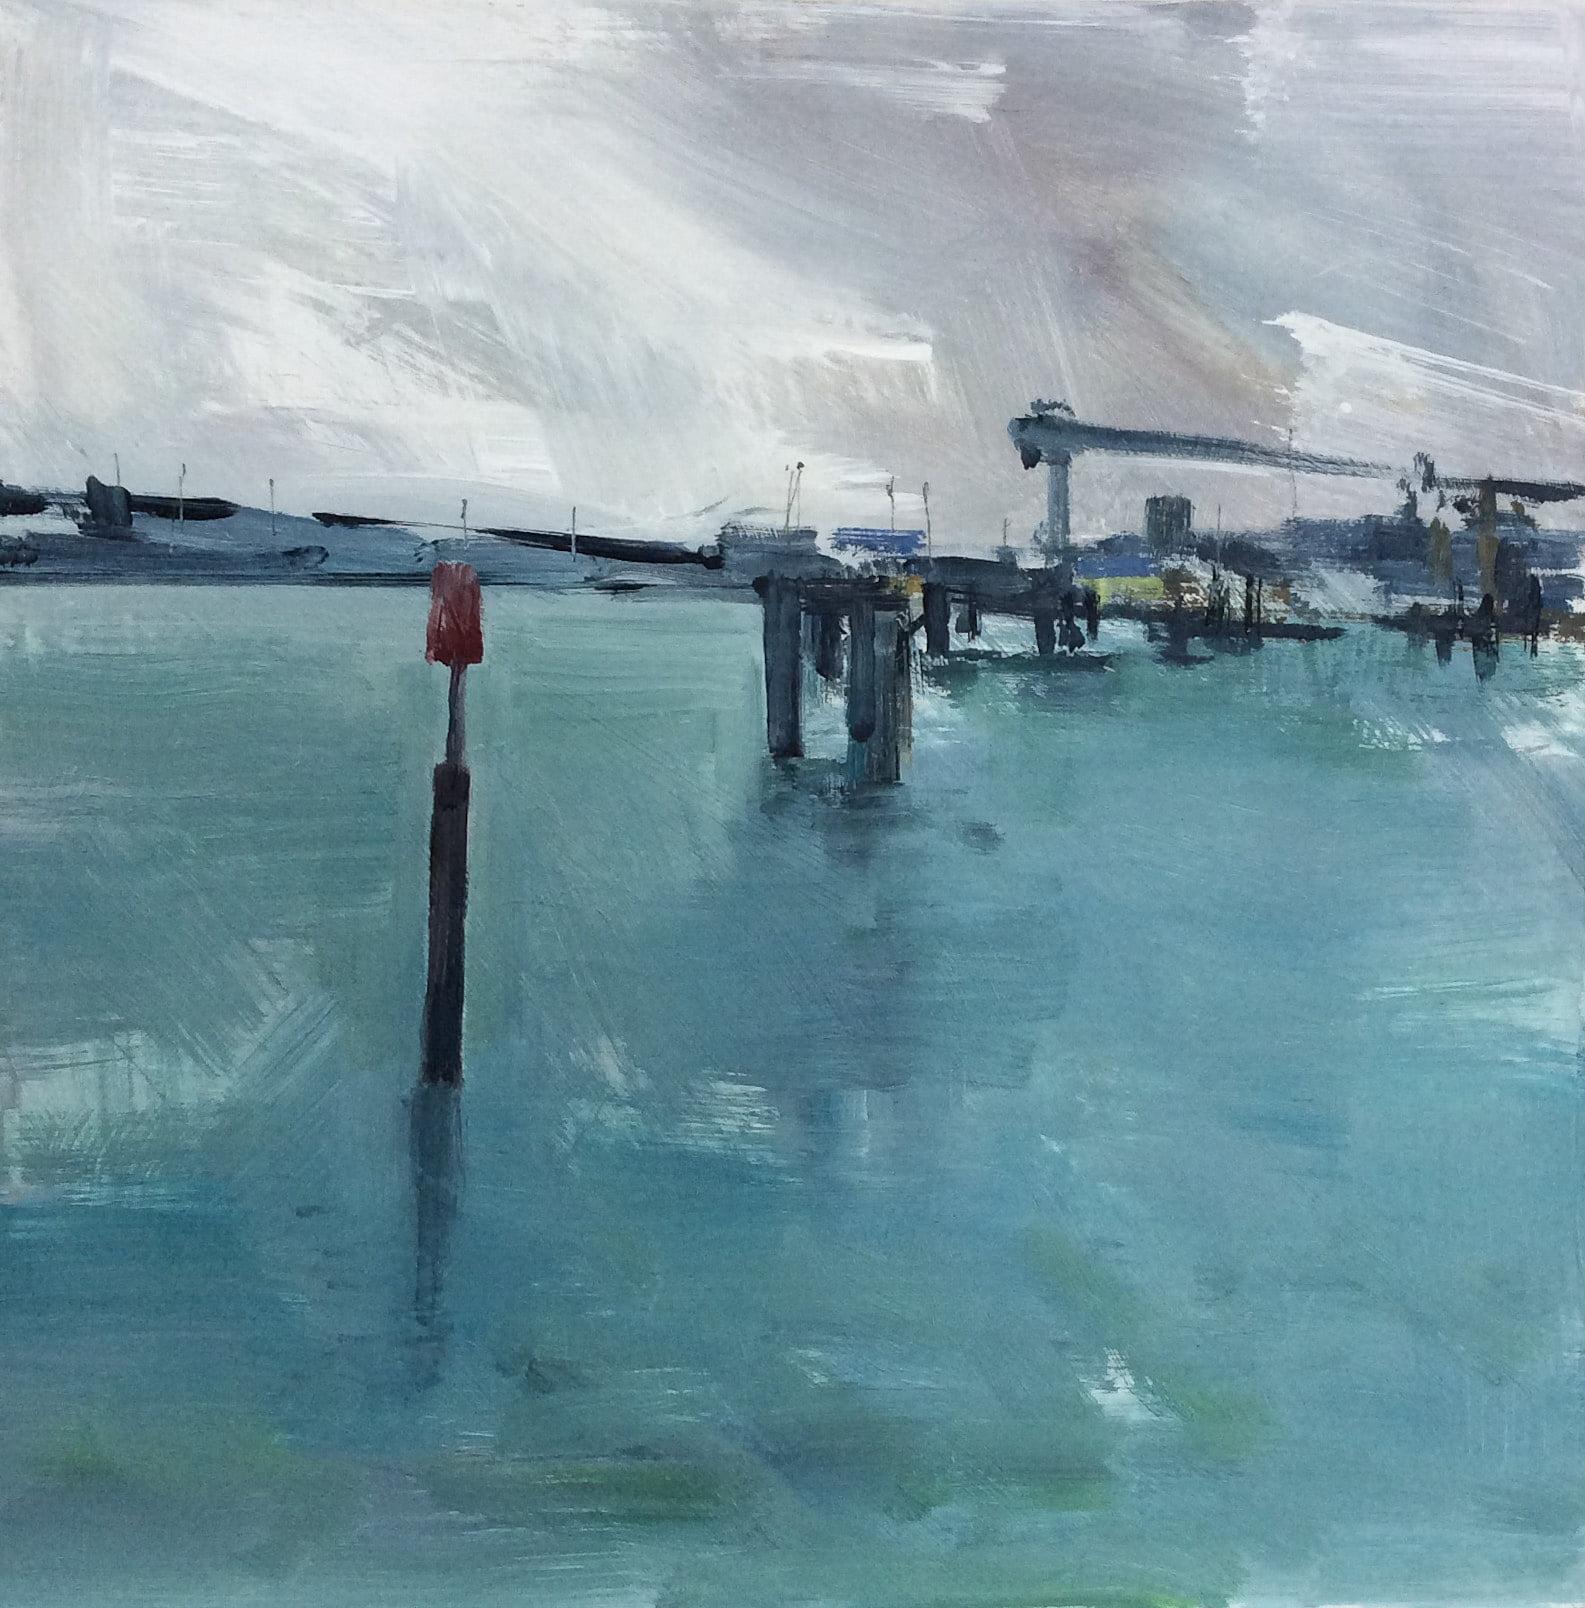 Ramsgate Docks